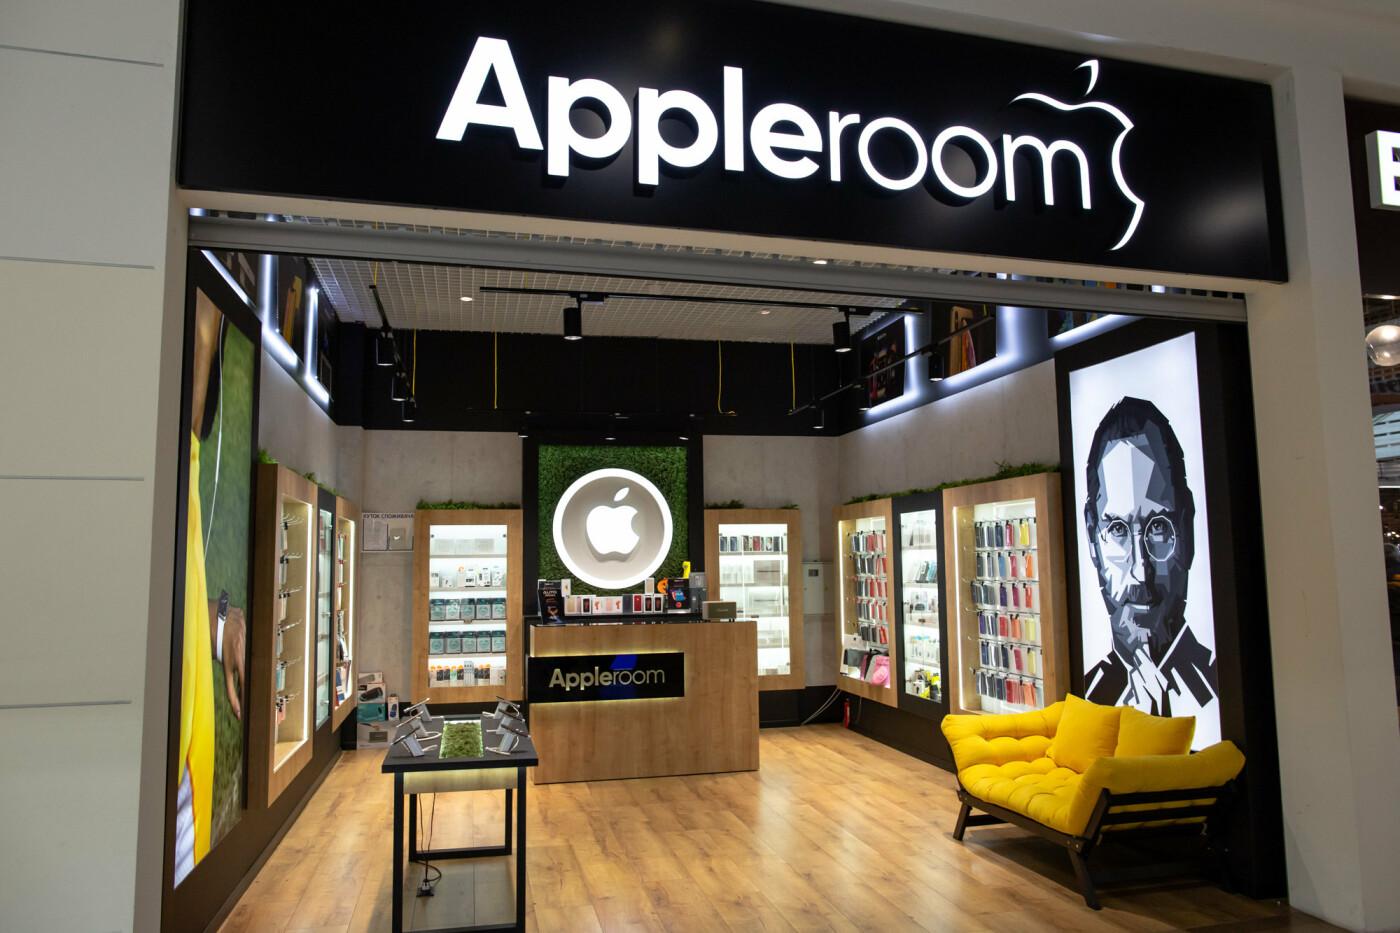 iPhone SE 2020 – найдешевший смартфон Apple вже в Apple Room, фото-10